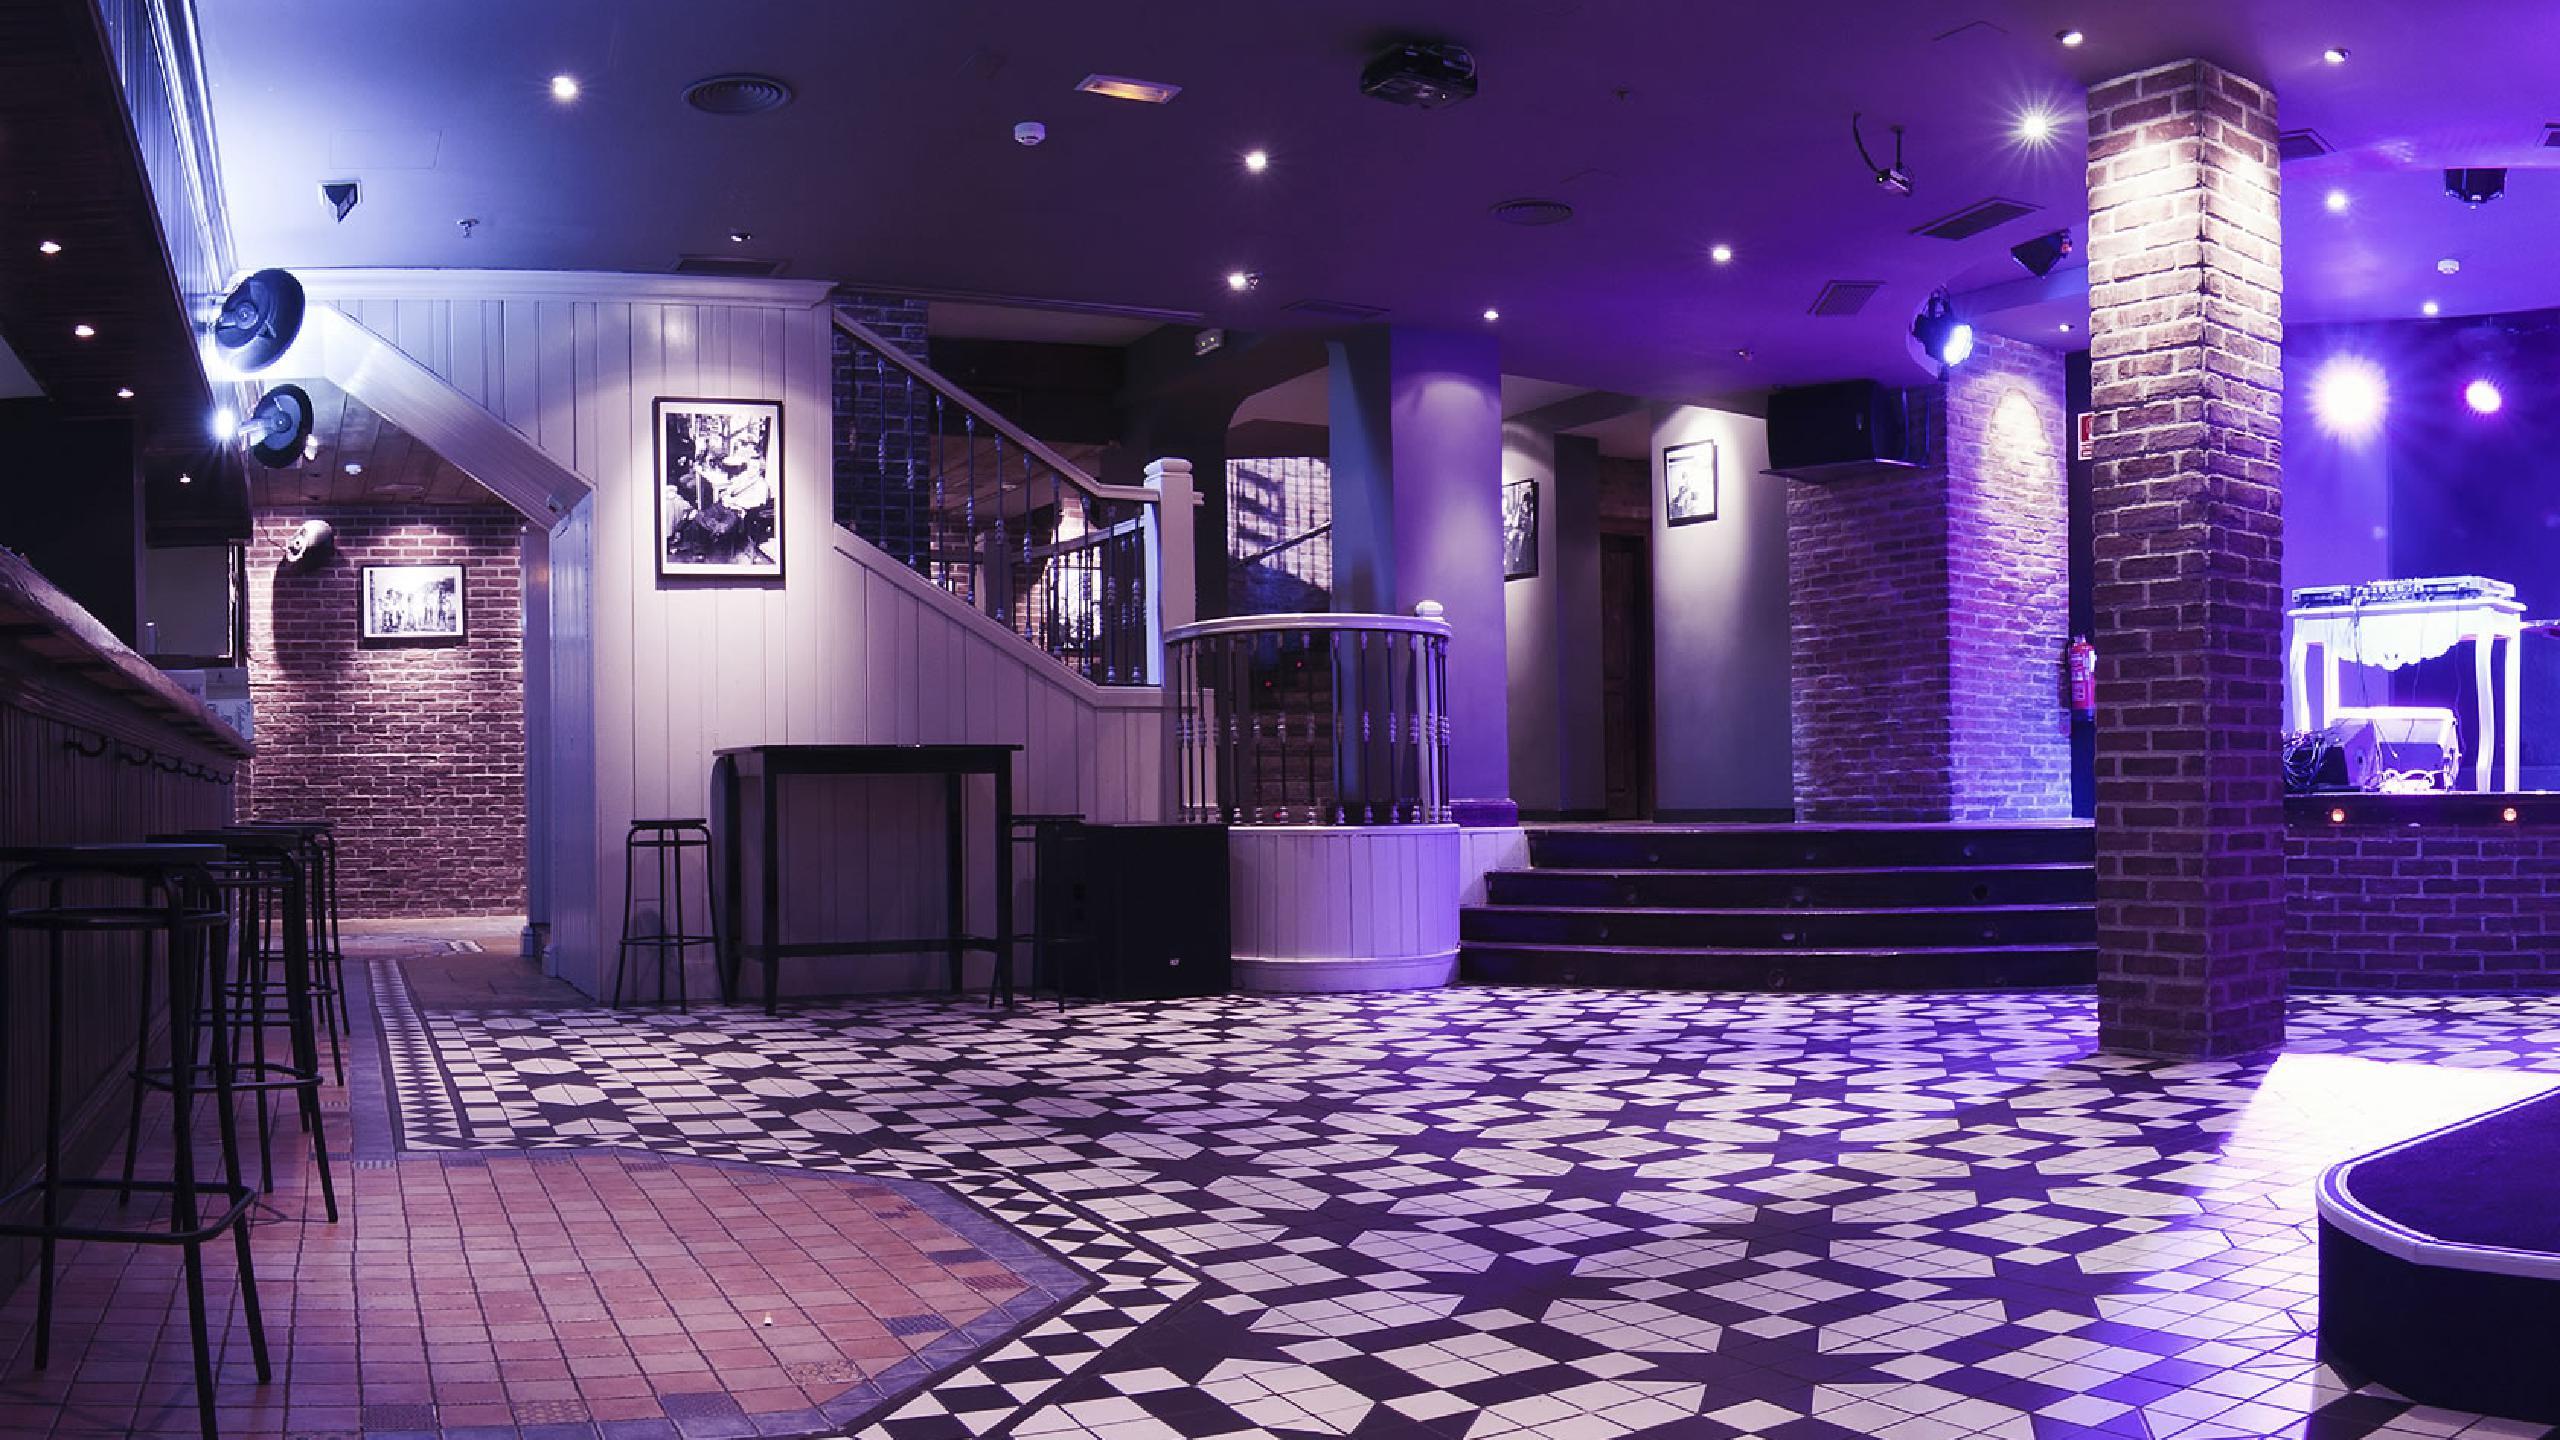 La Cocina Rock Bar Tickets And Concerts 2020 2021 Wegow United